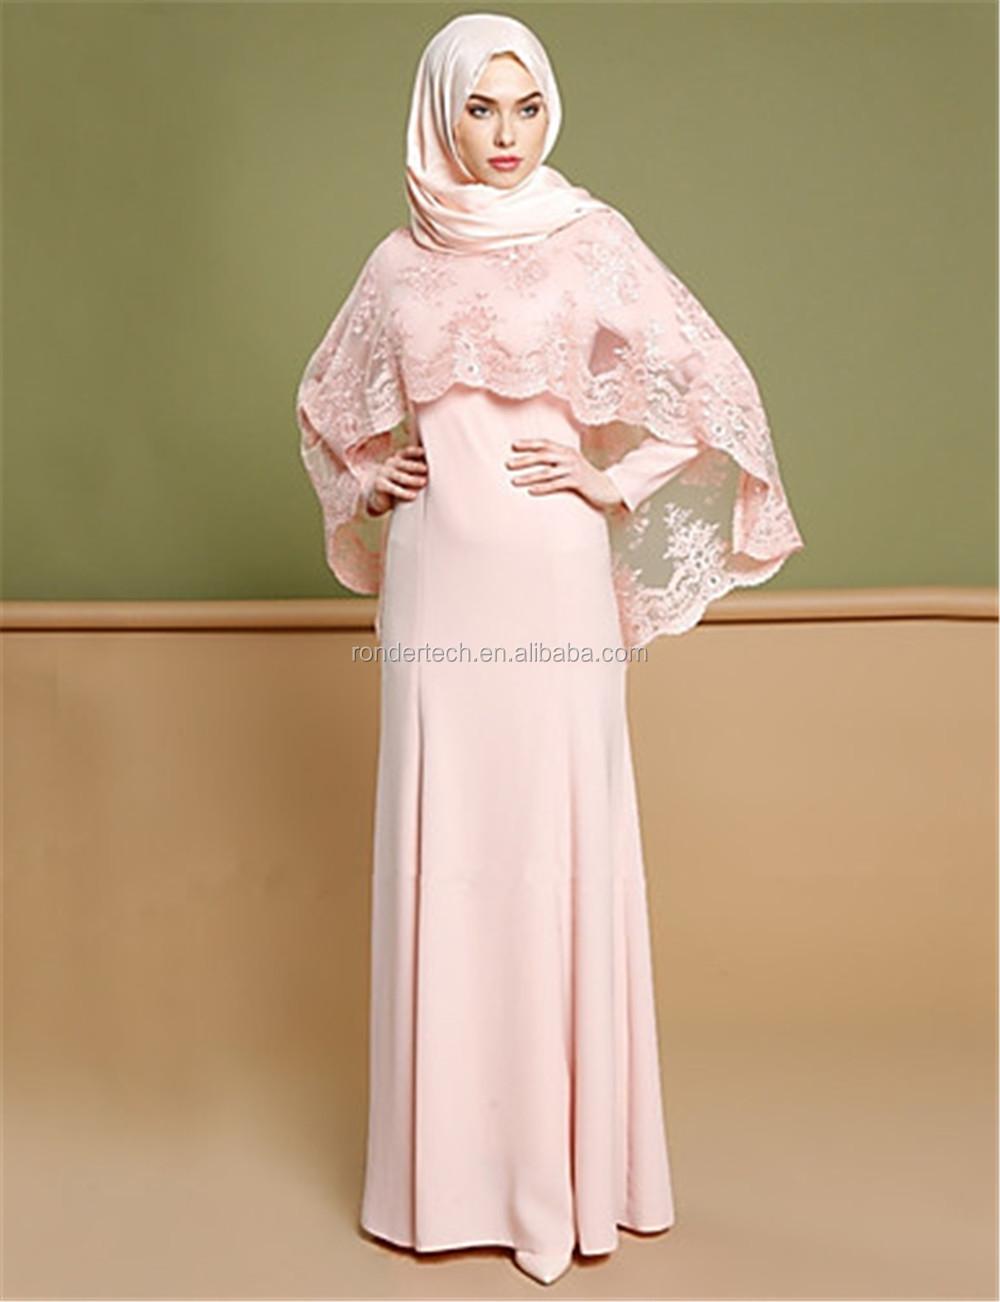 Gaun Malam Arab Muslim Jilbab Untuk Gaun Pengiring Pengantin Renda Katun  A-line Lengan Panjang Elegan Abu-abu Pink Dresses Gaun - Buy Gaun Malam  Untuk